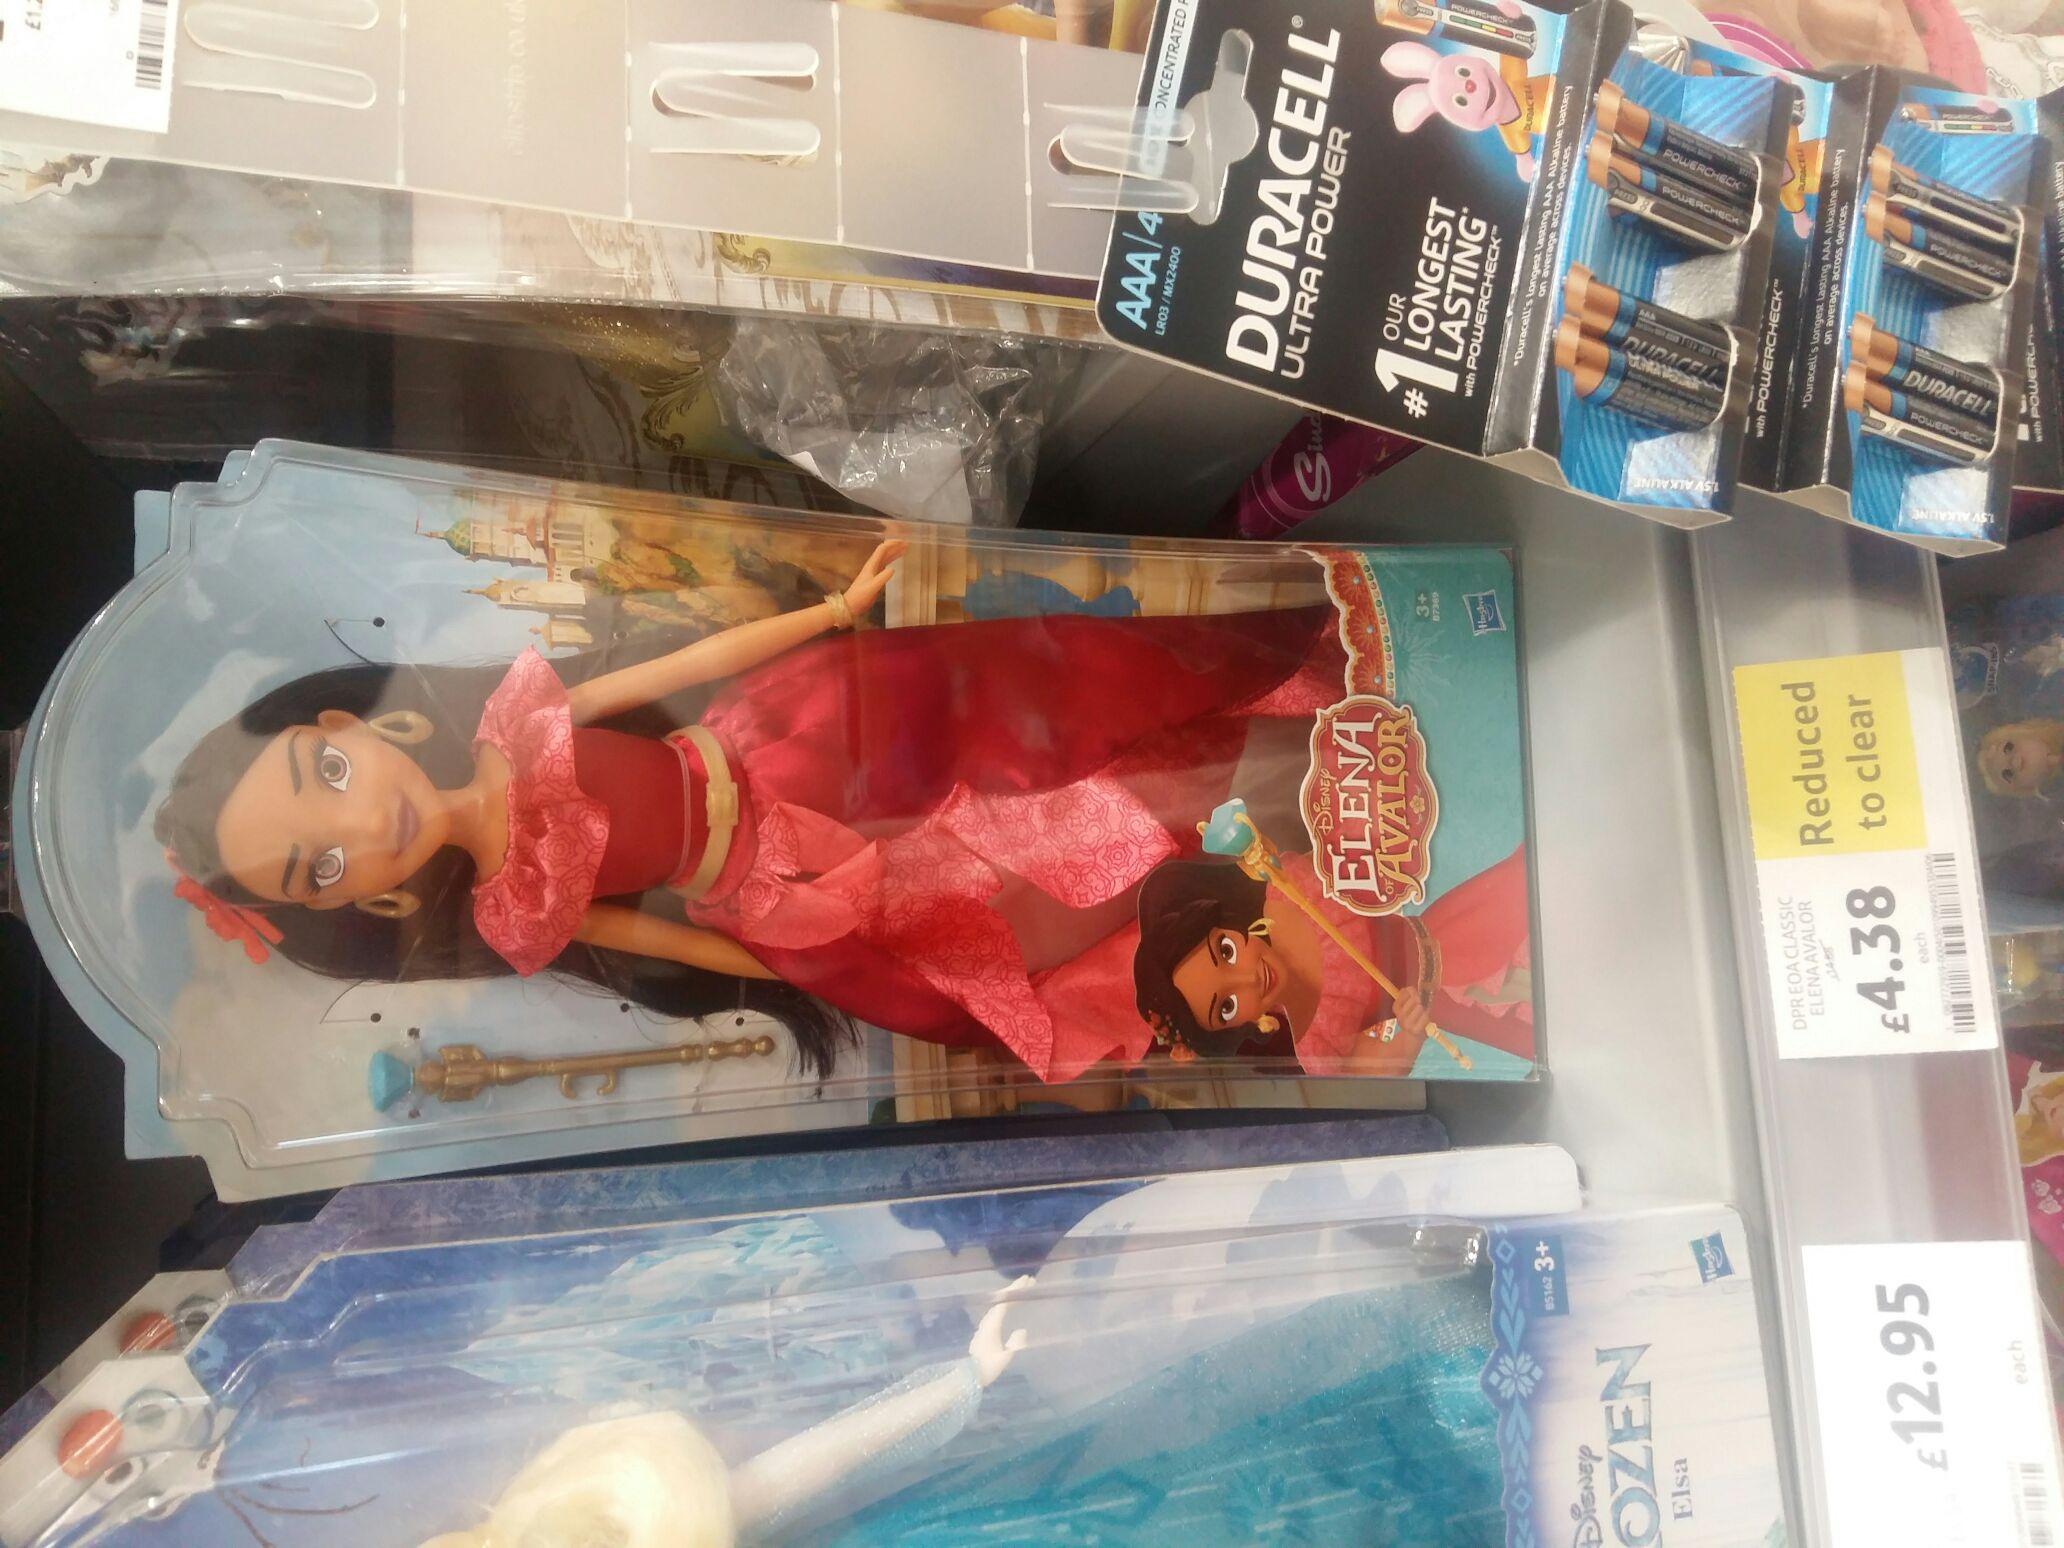 Disney Elena of Avalor doll £4.38 at Tesco Roborough